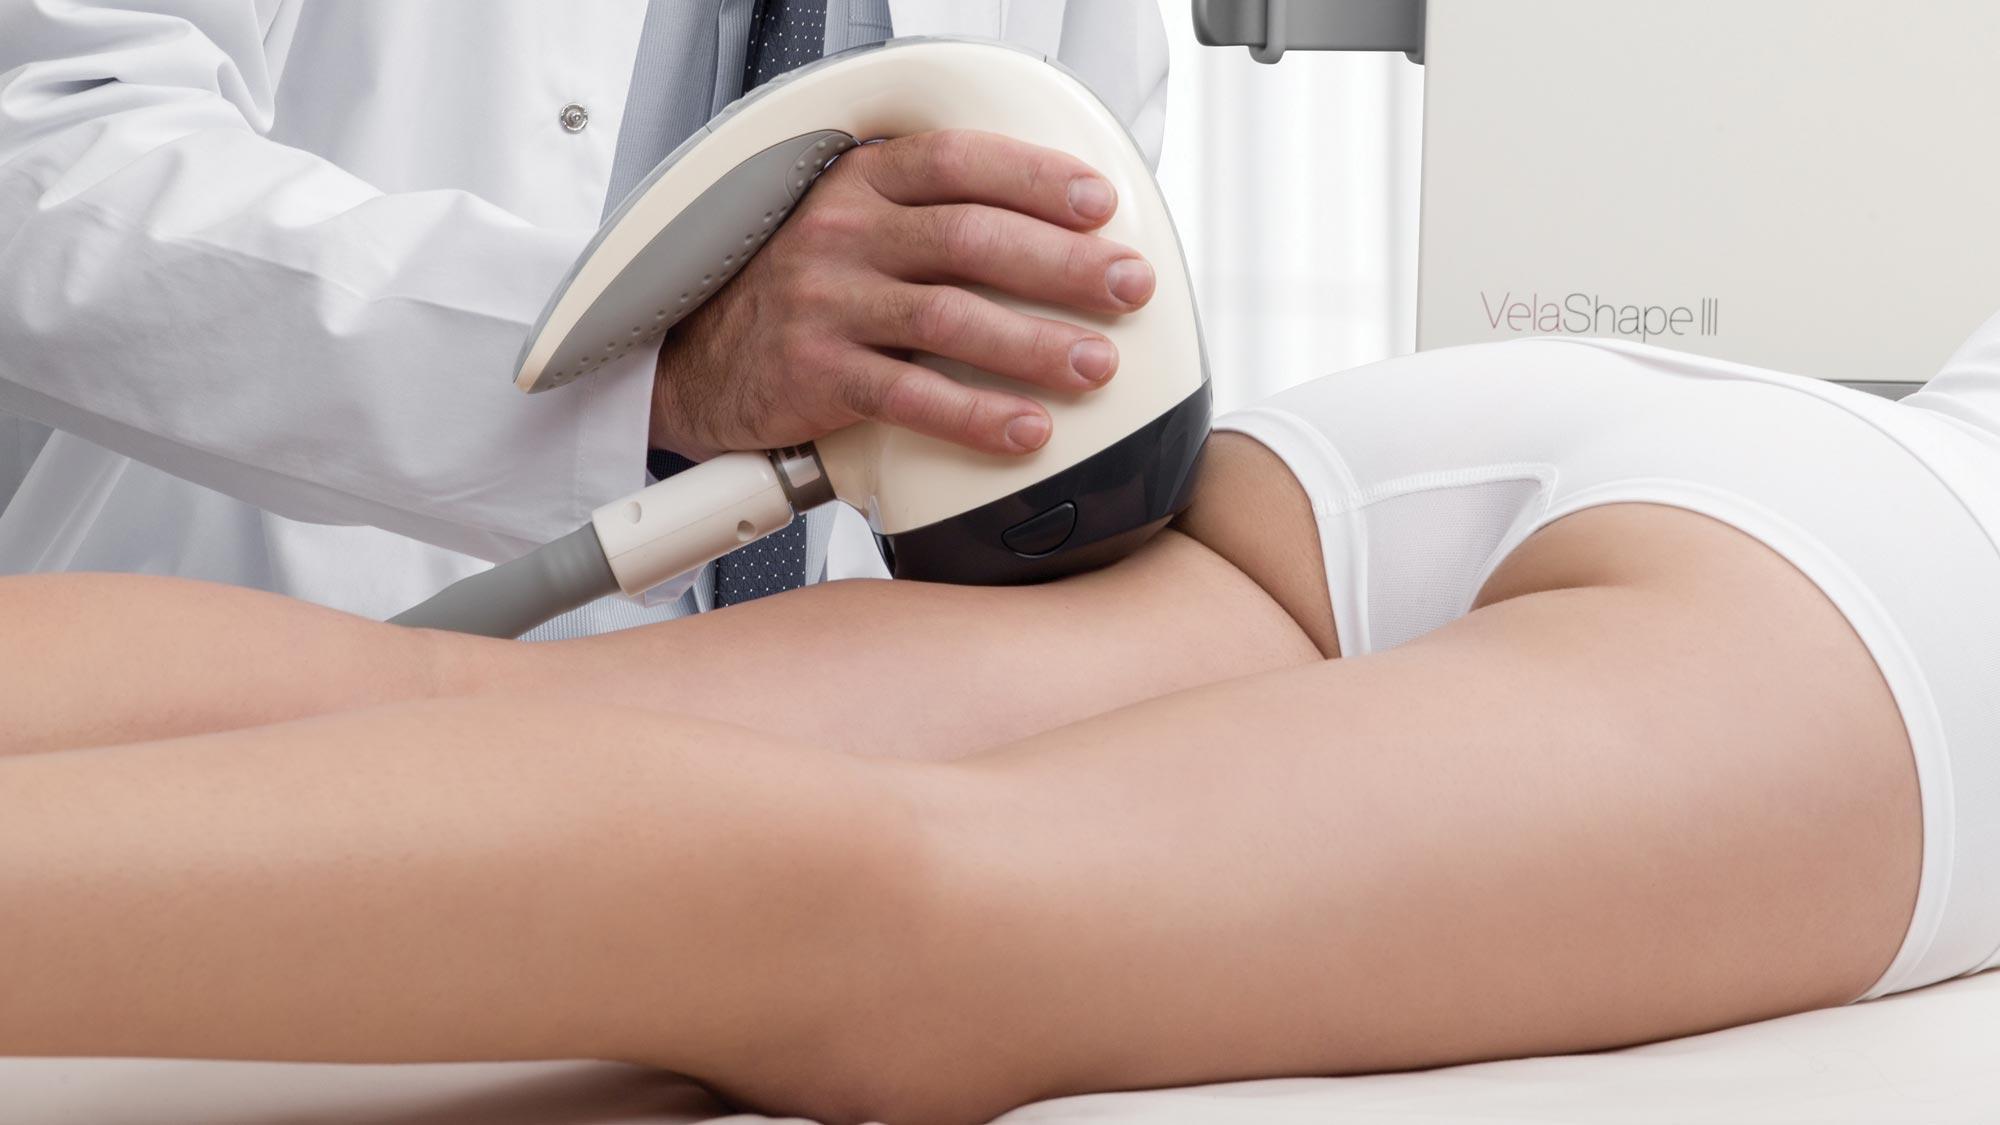 terapie tratare celulita Velashape 3 Alto Studio